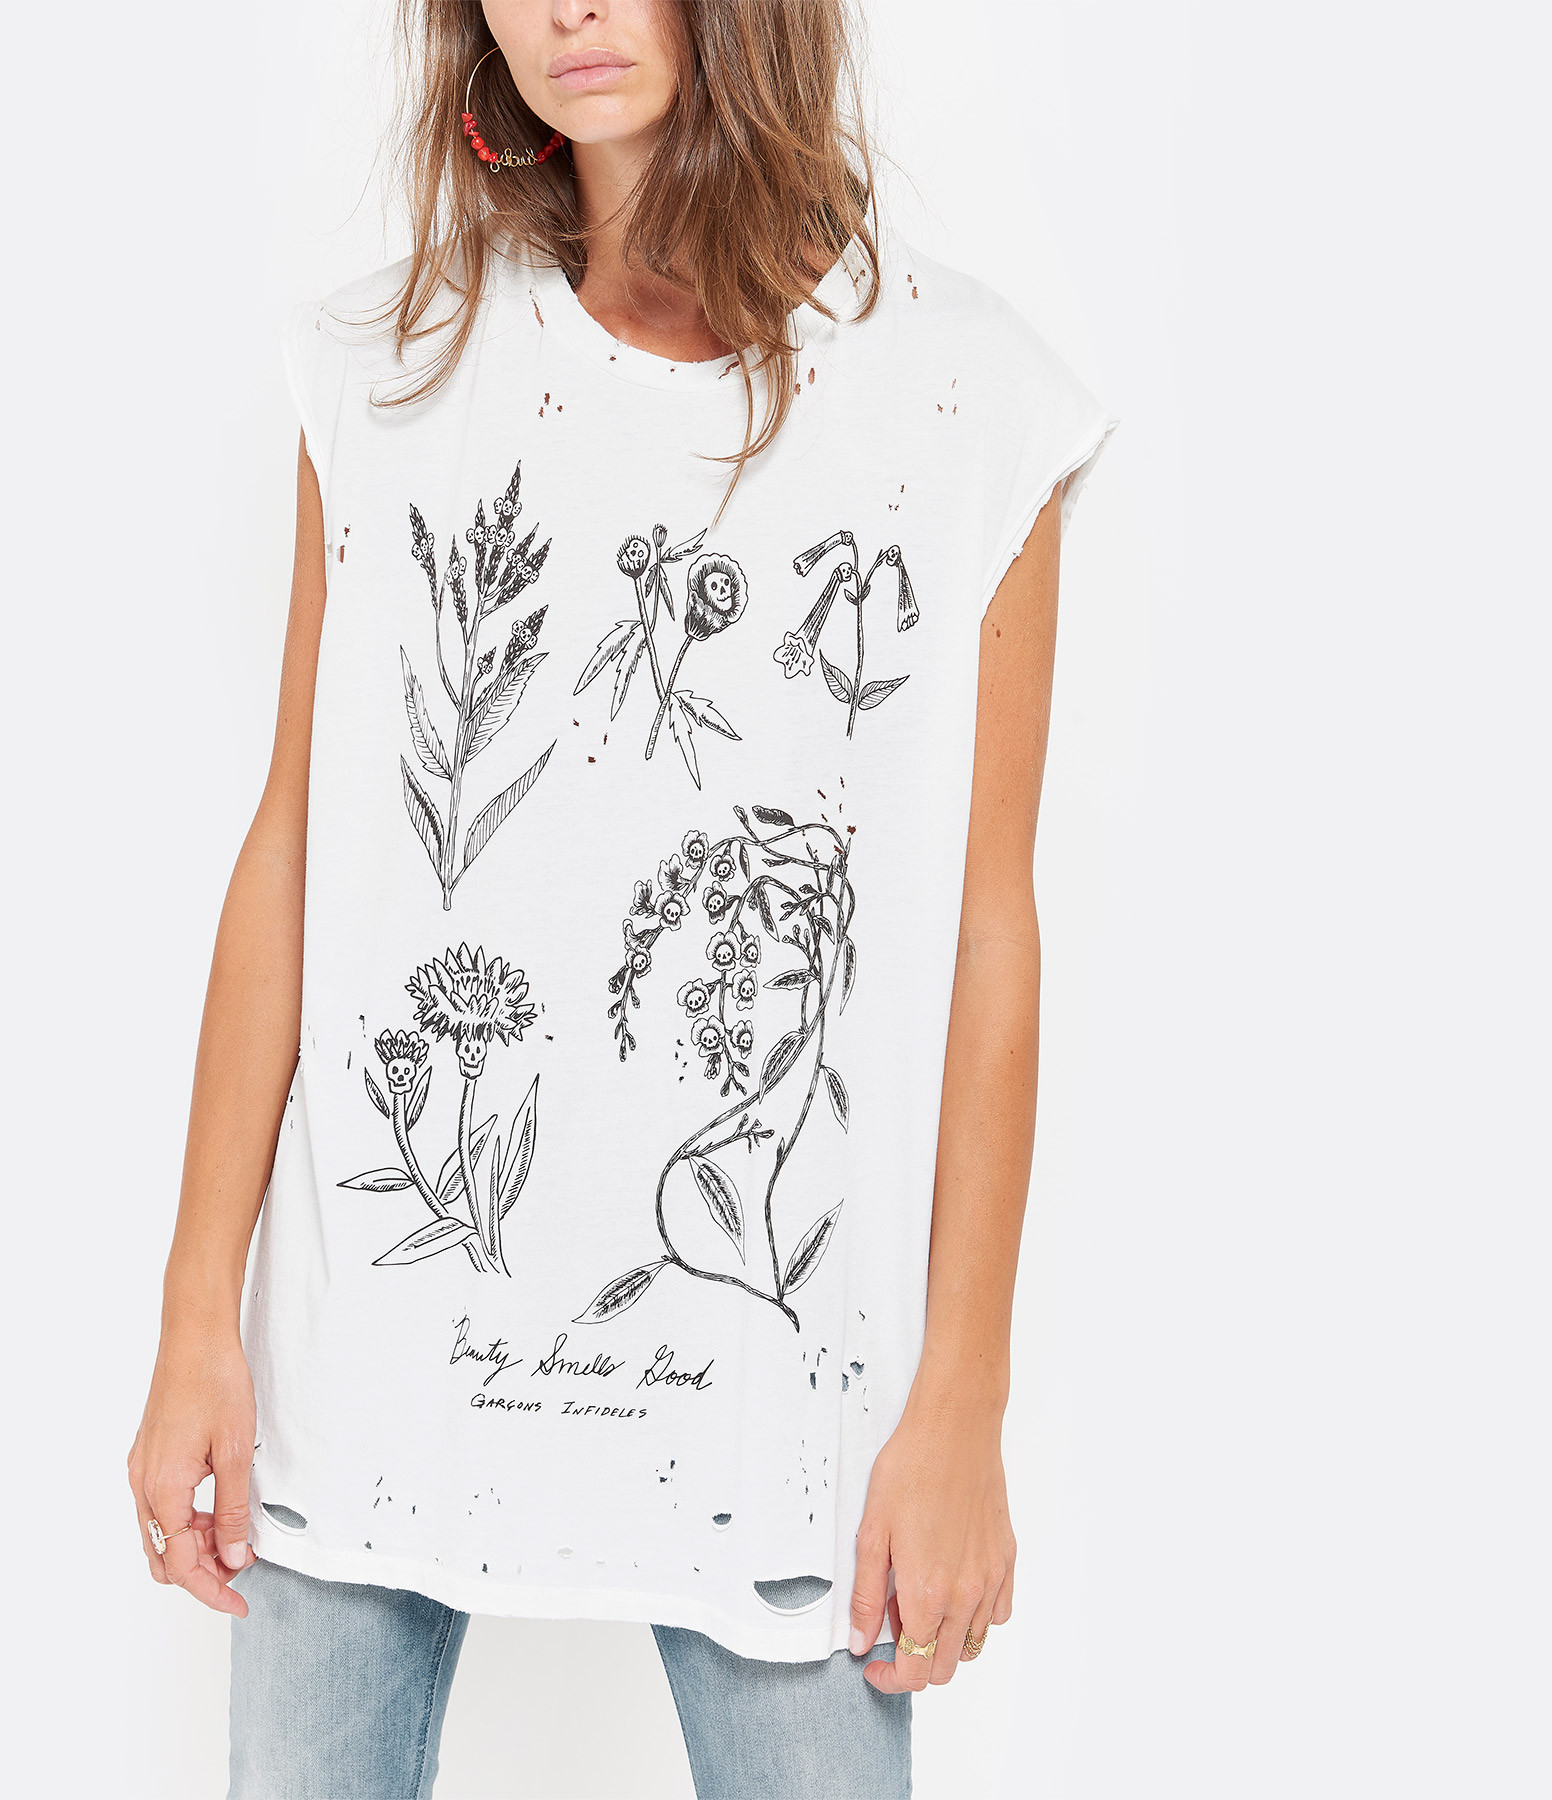 GARCONS INFIDELES - Débardeur Sleeve Coton Blanc